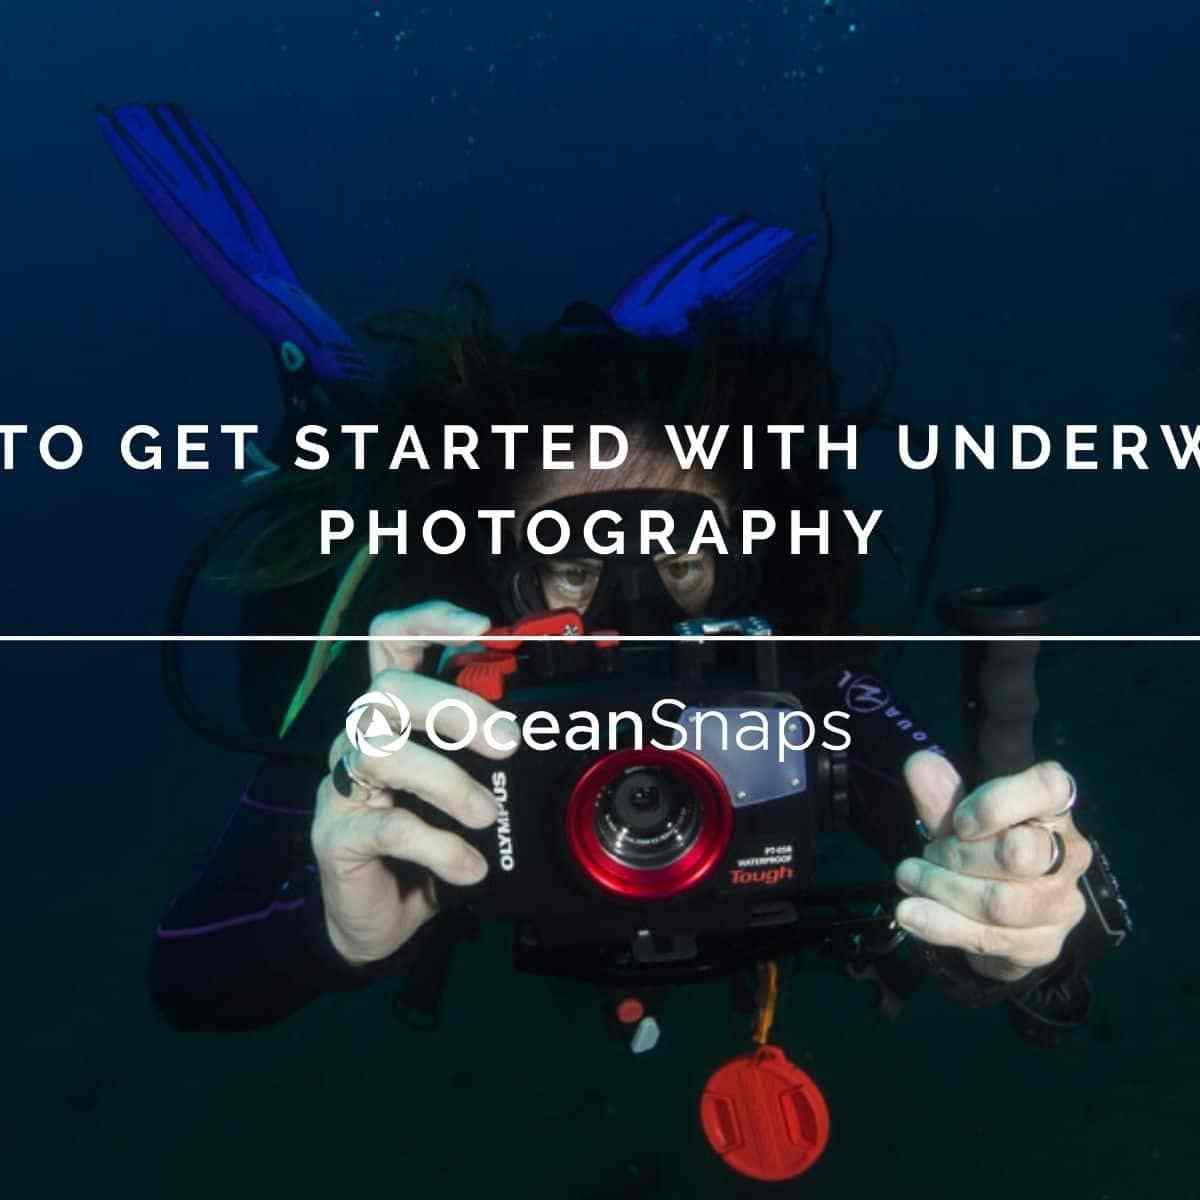 Get started underwater photography